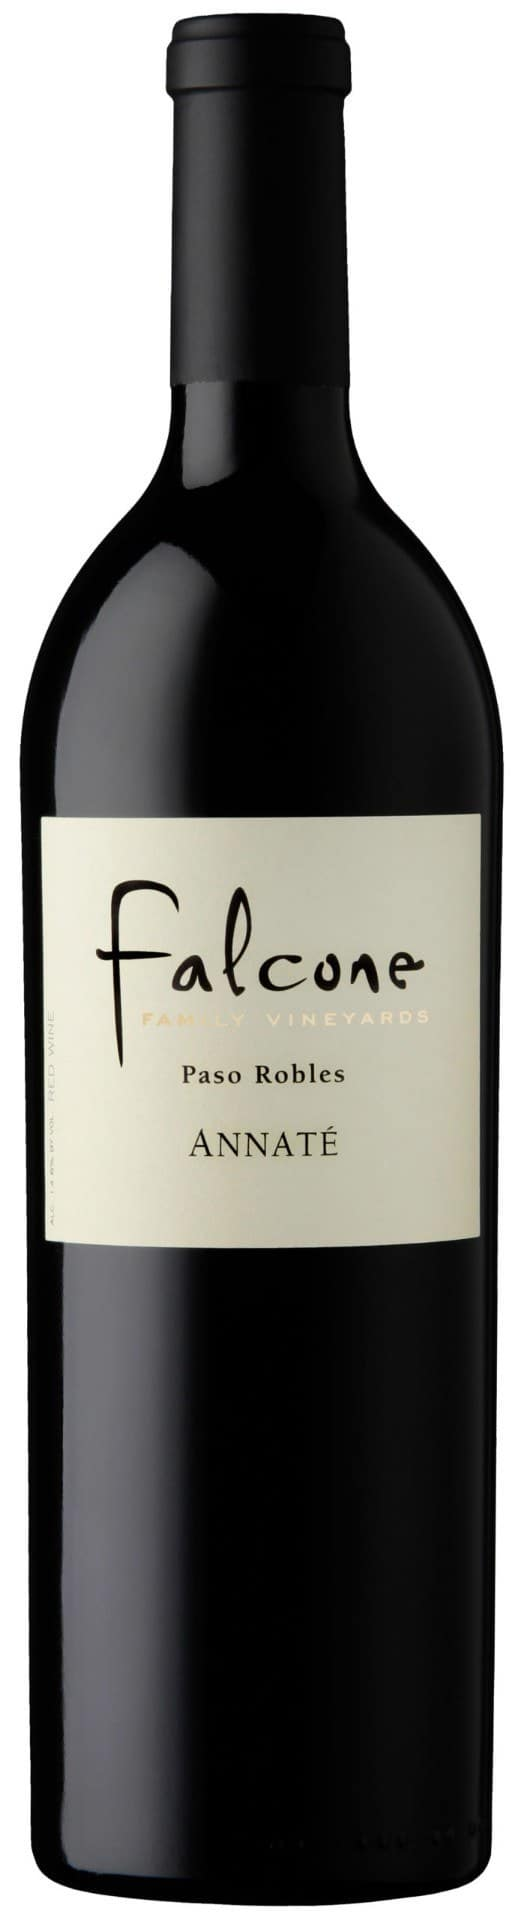 Falcone NV Annaté IX Red wine